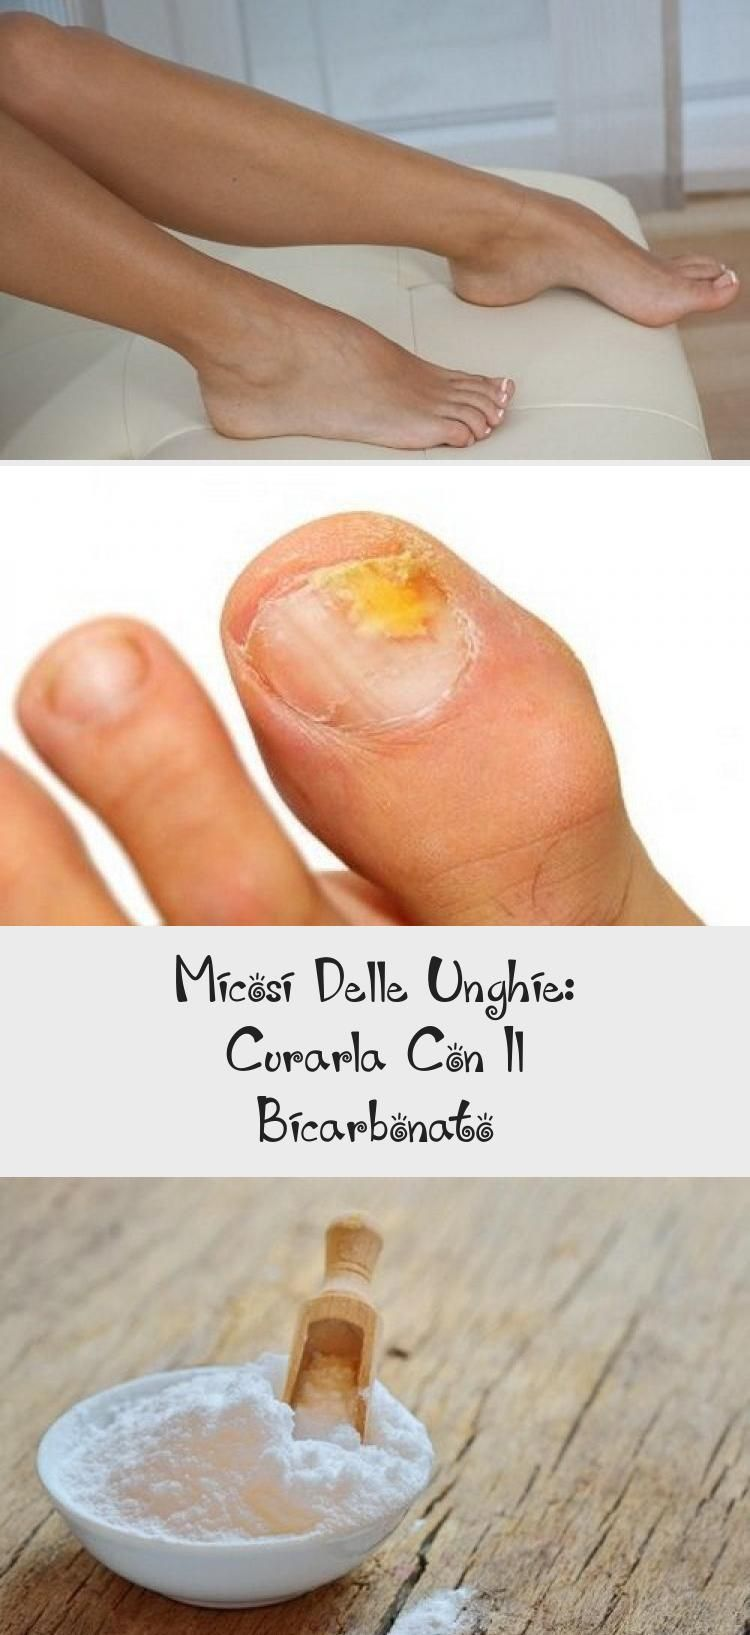 Nail Fungus: Treat It With Bicarbonate  Nail Desing  #bicarbonate #desing #fun